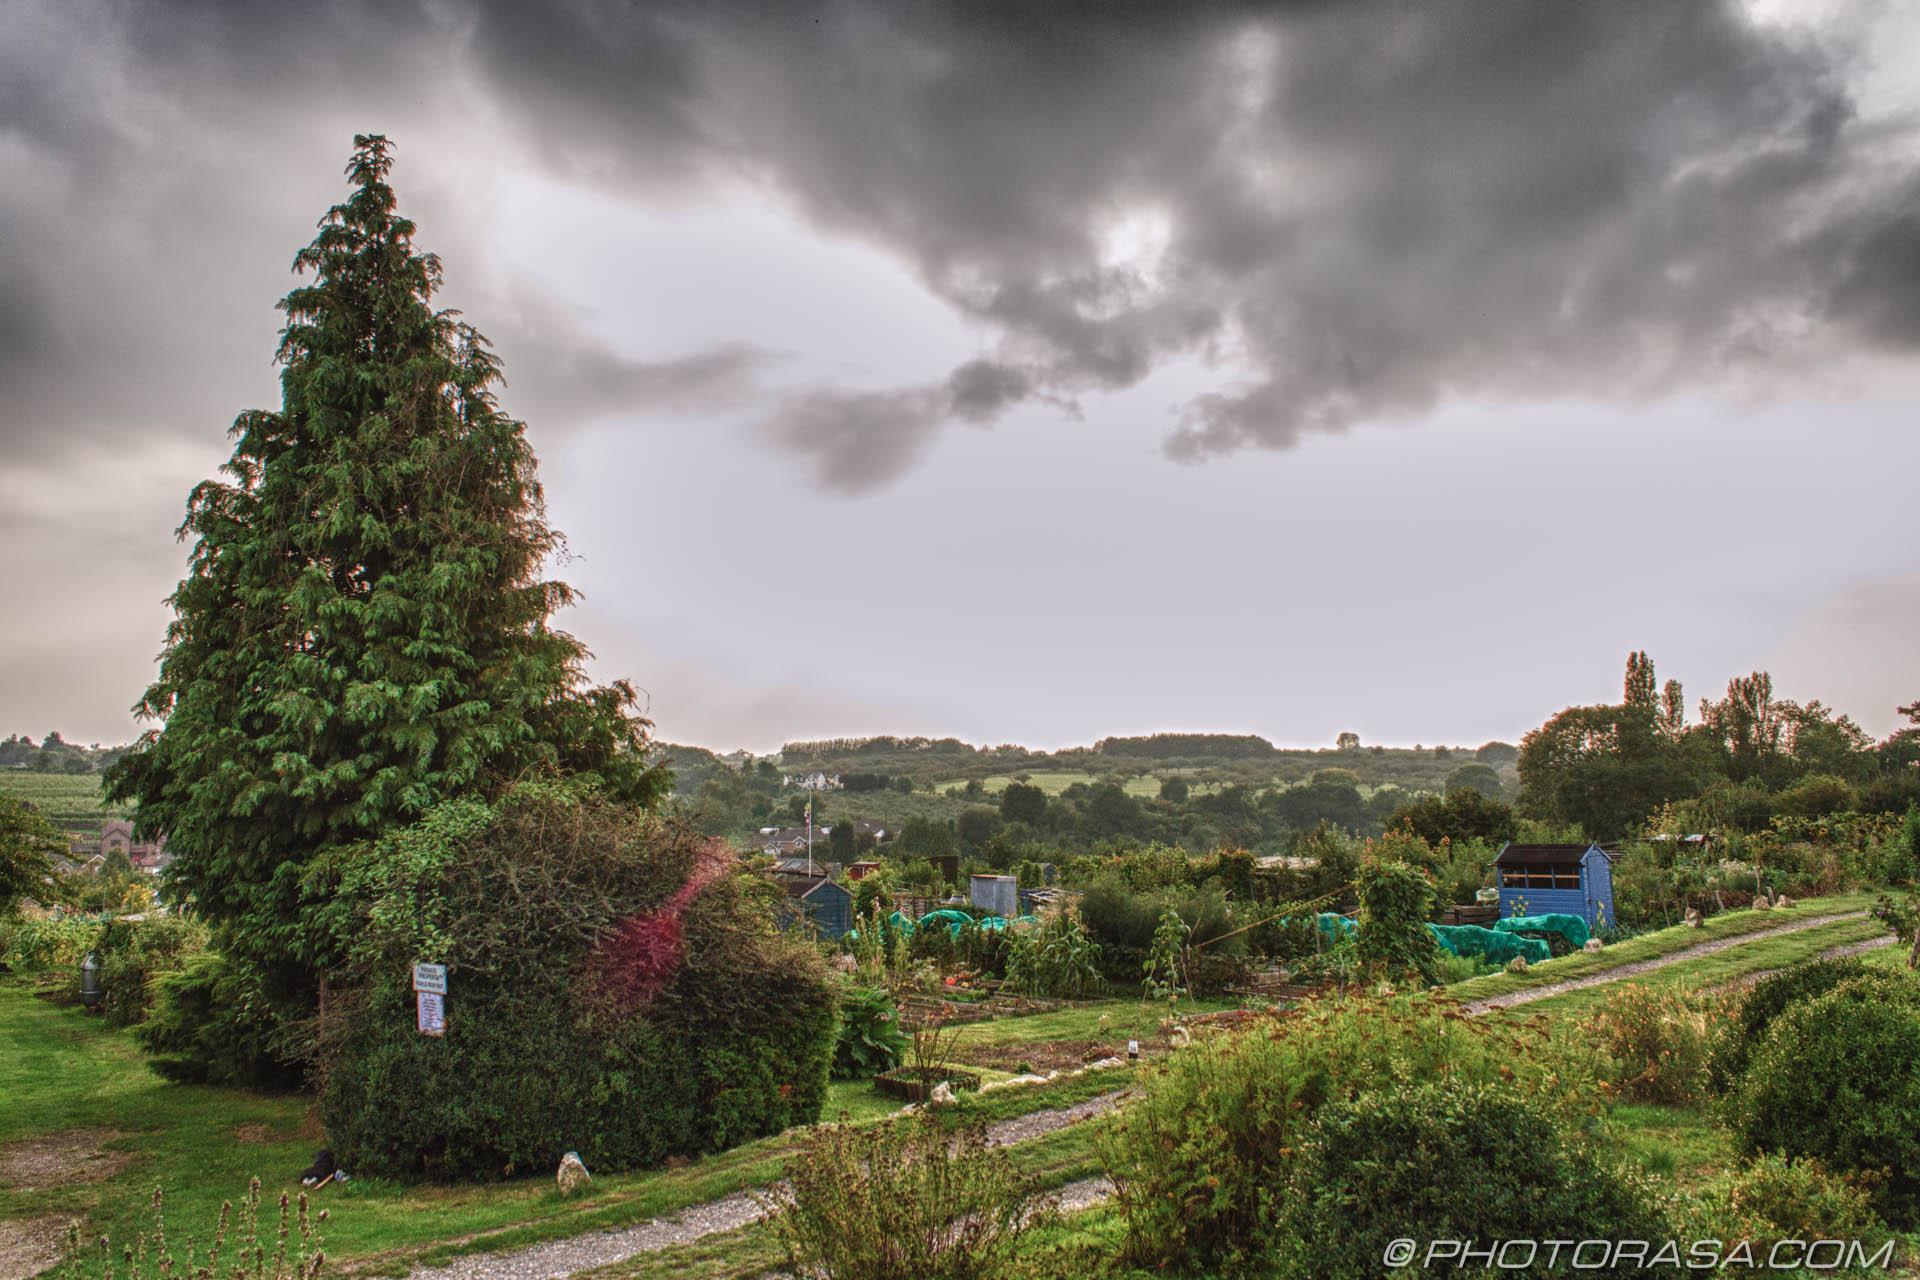 https://photorasa.com/loose-village/dark-clouds-over-the-allotment/